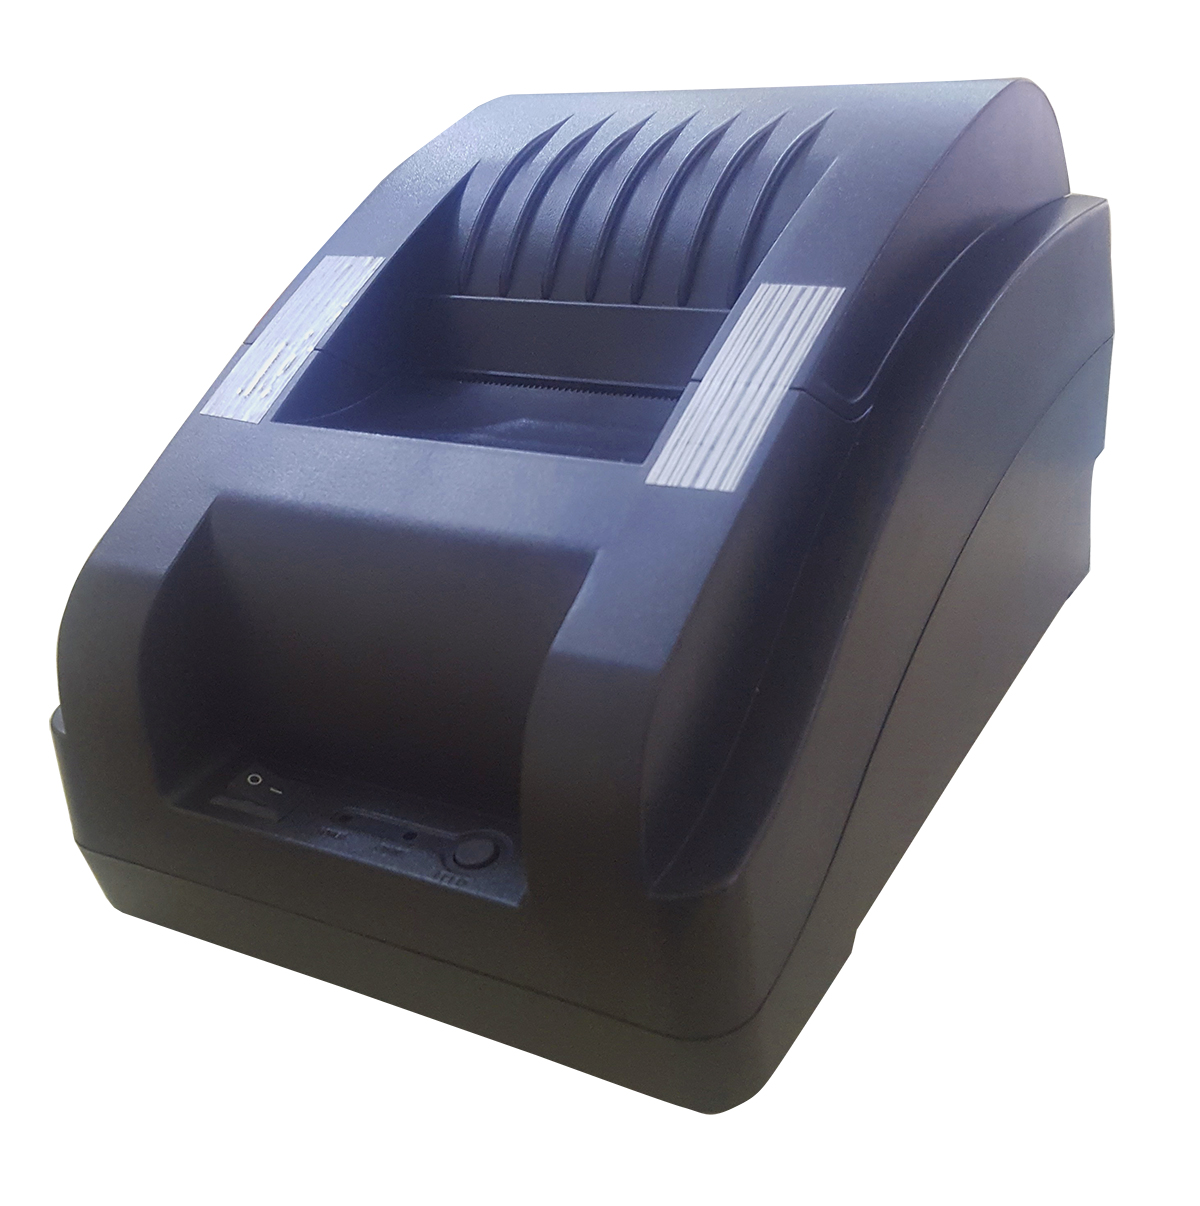 Máy in hóa đơn Antech RP58B-U